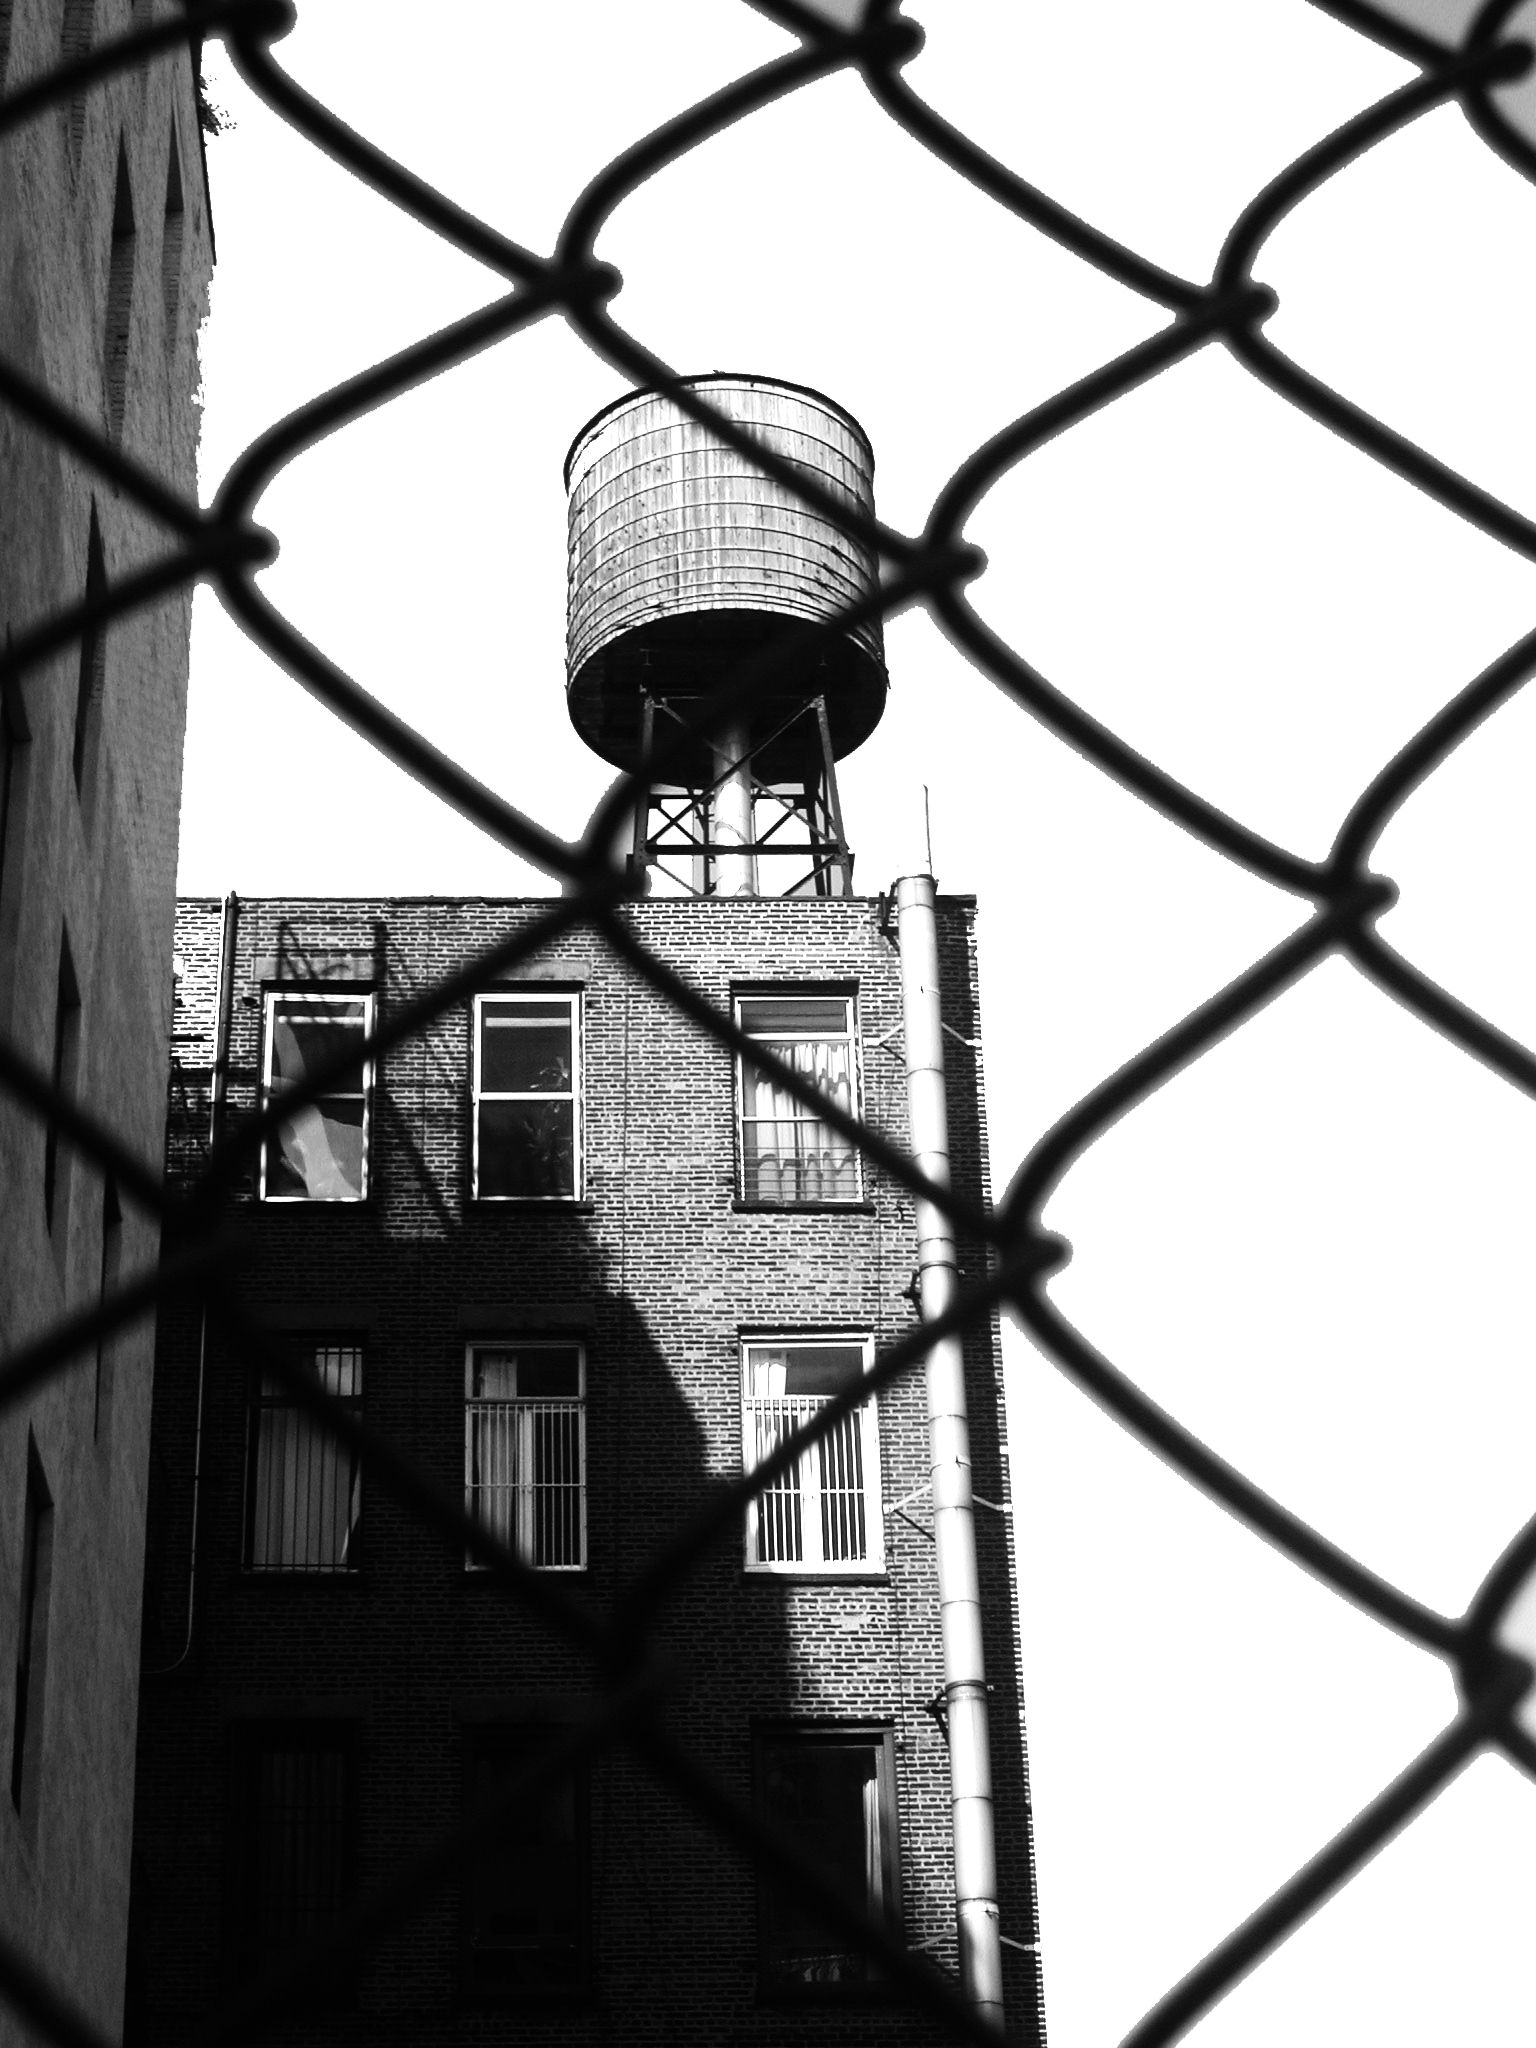 NY, 2007